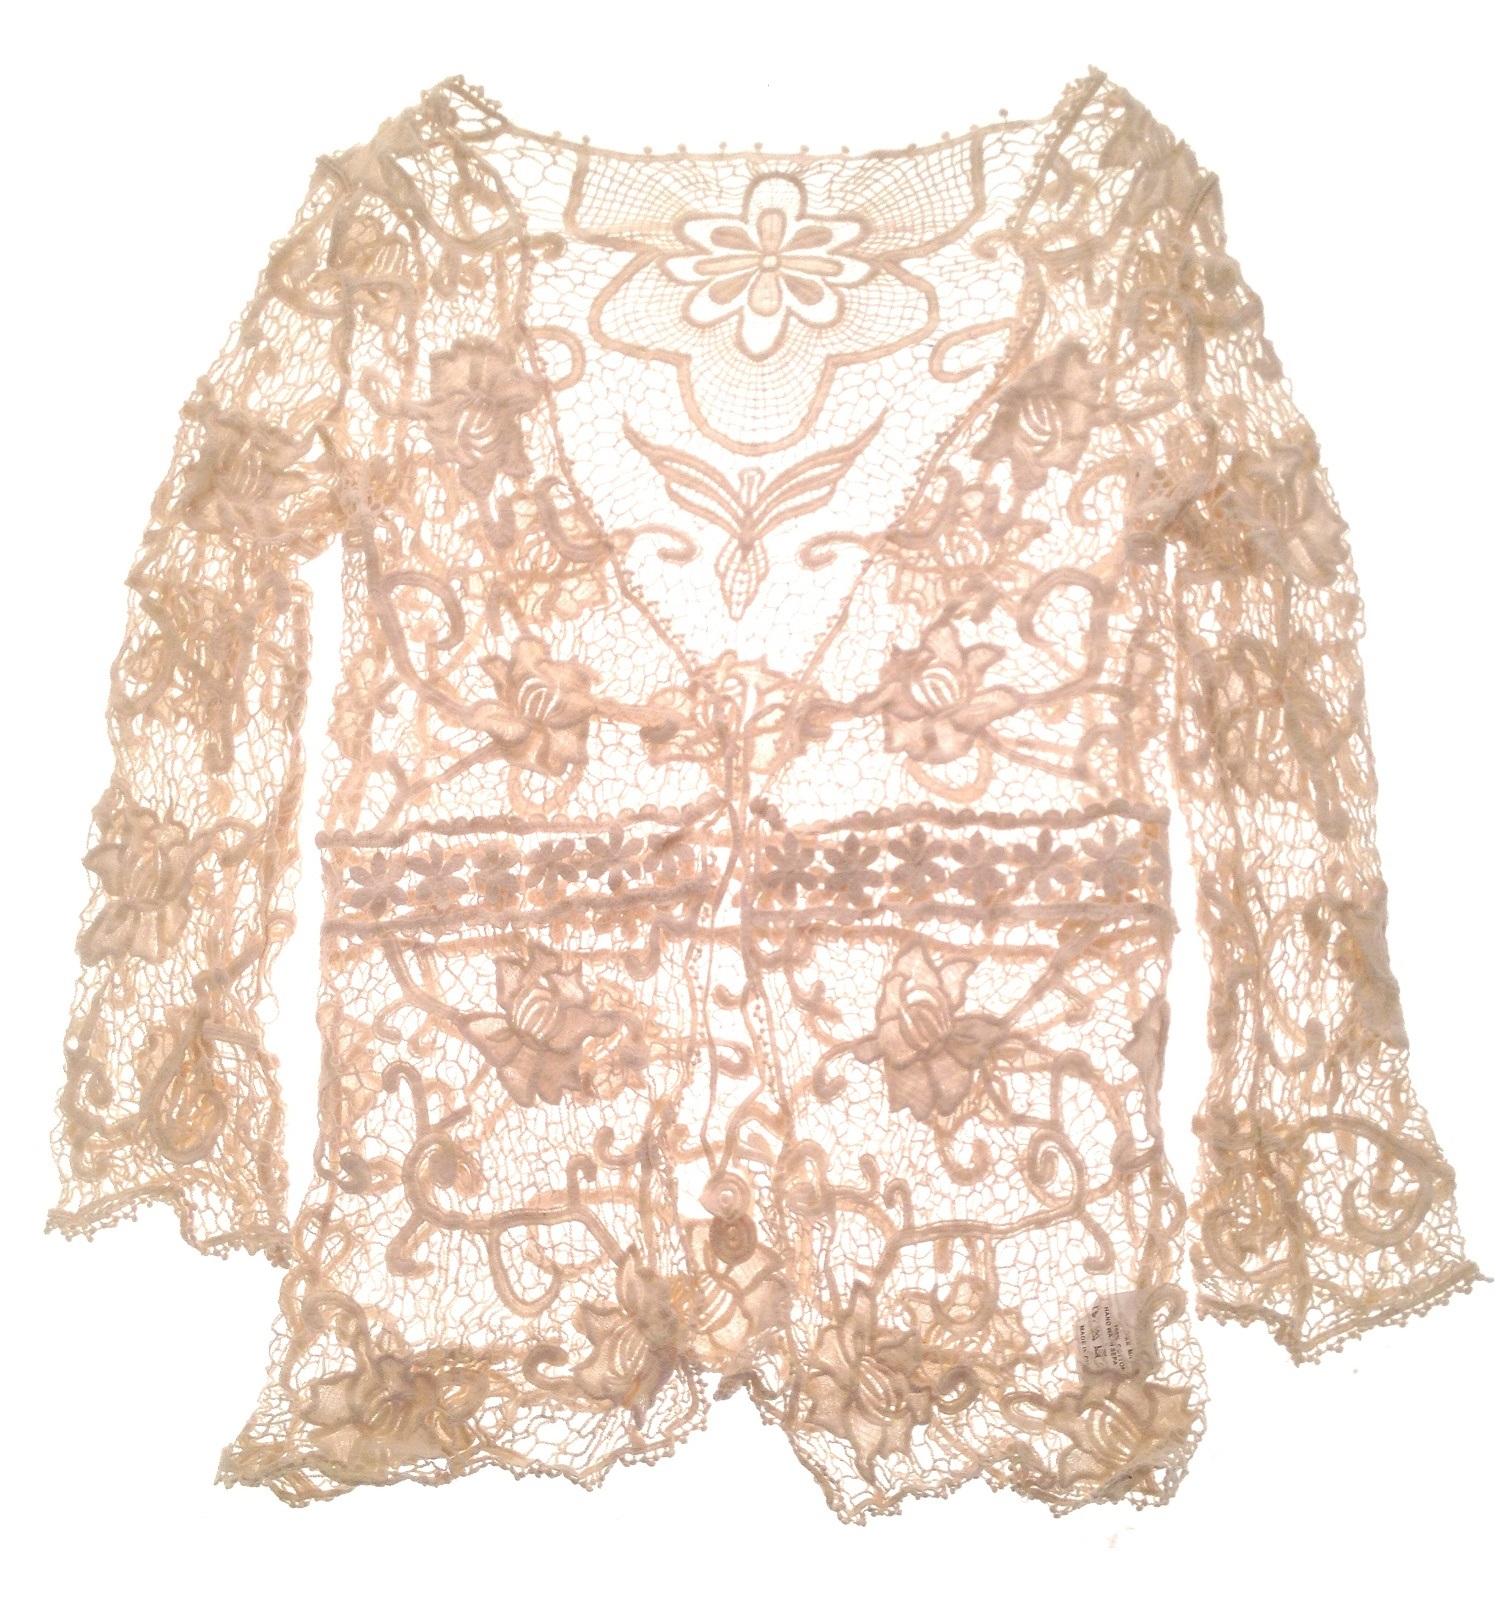 Book Cover Crochet Jacket ~ Womens cotton crochet knitted jacket cardigan top beach